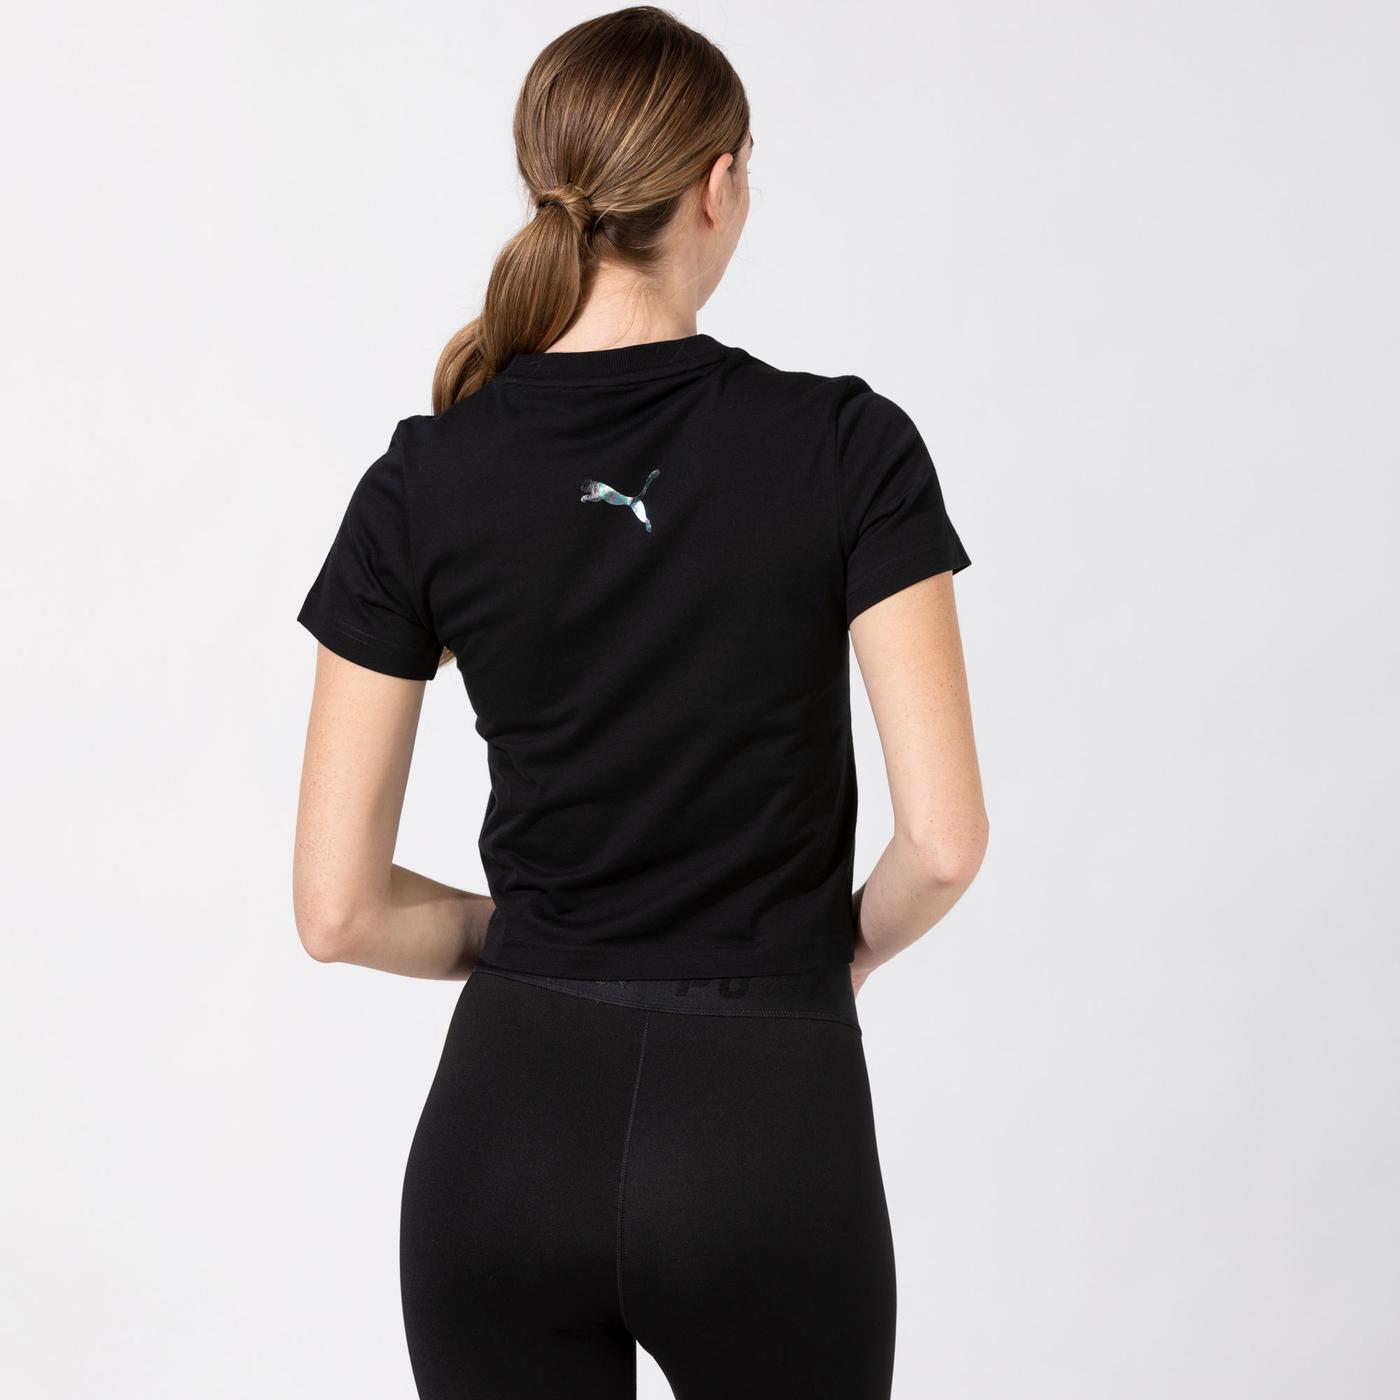 Puma Evide Graphic Kadın Siyah T-Shirt